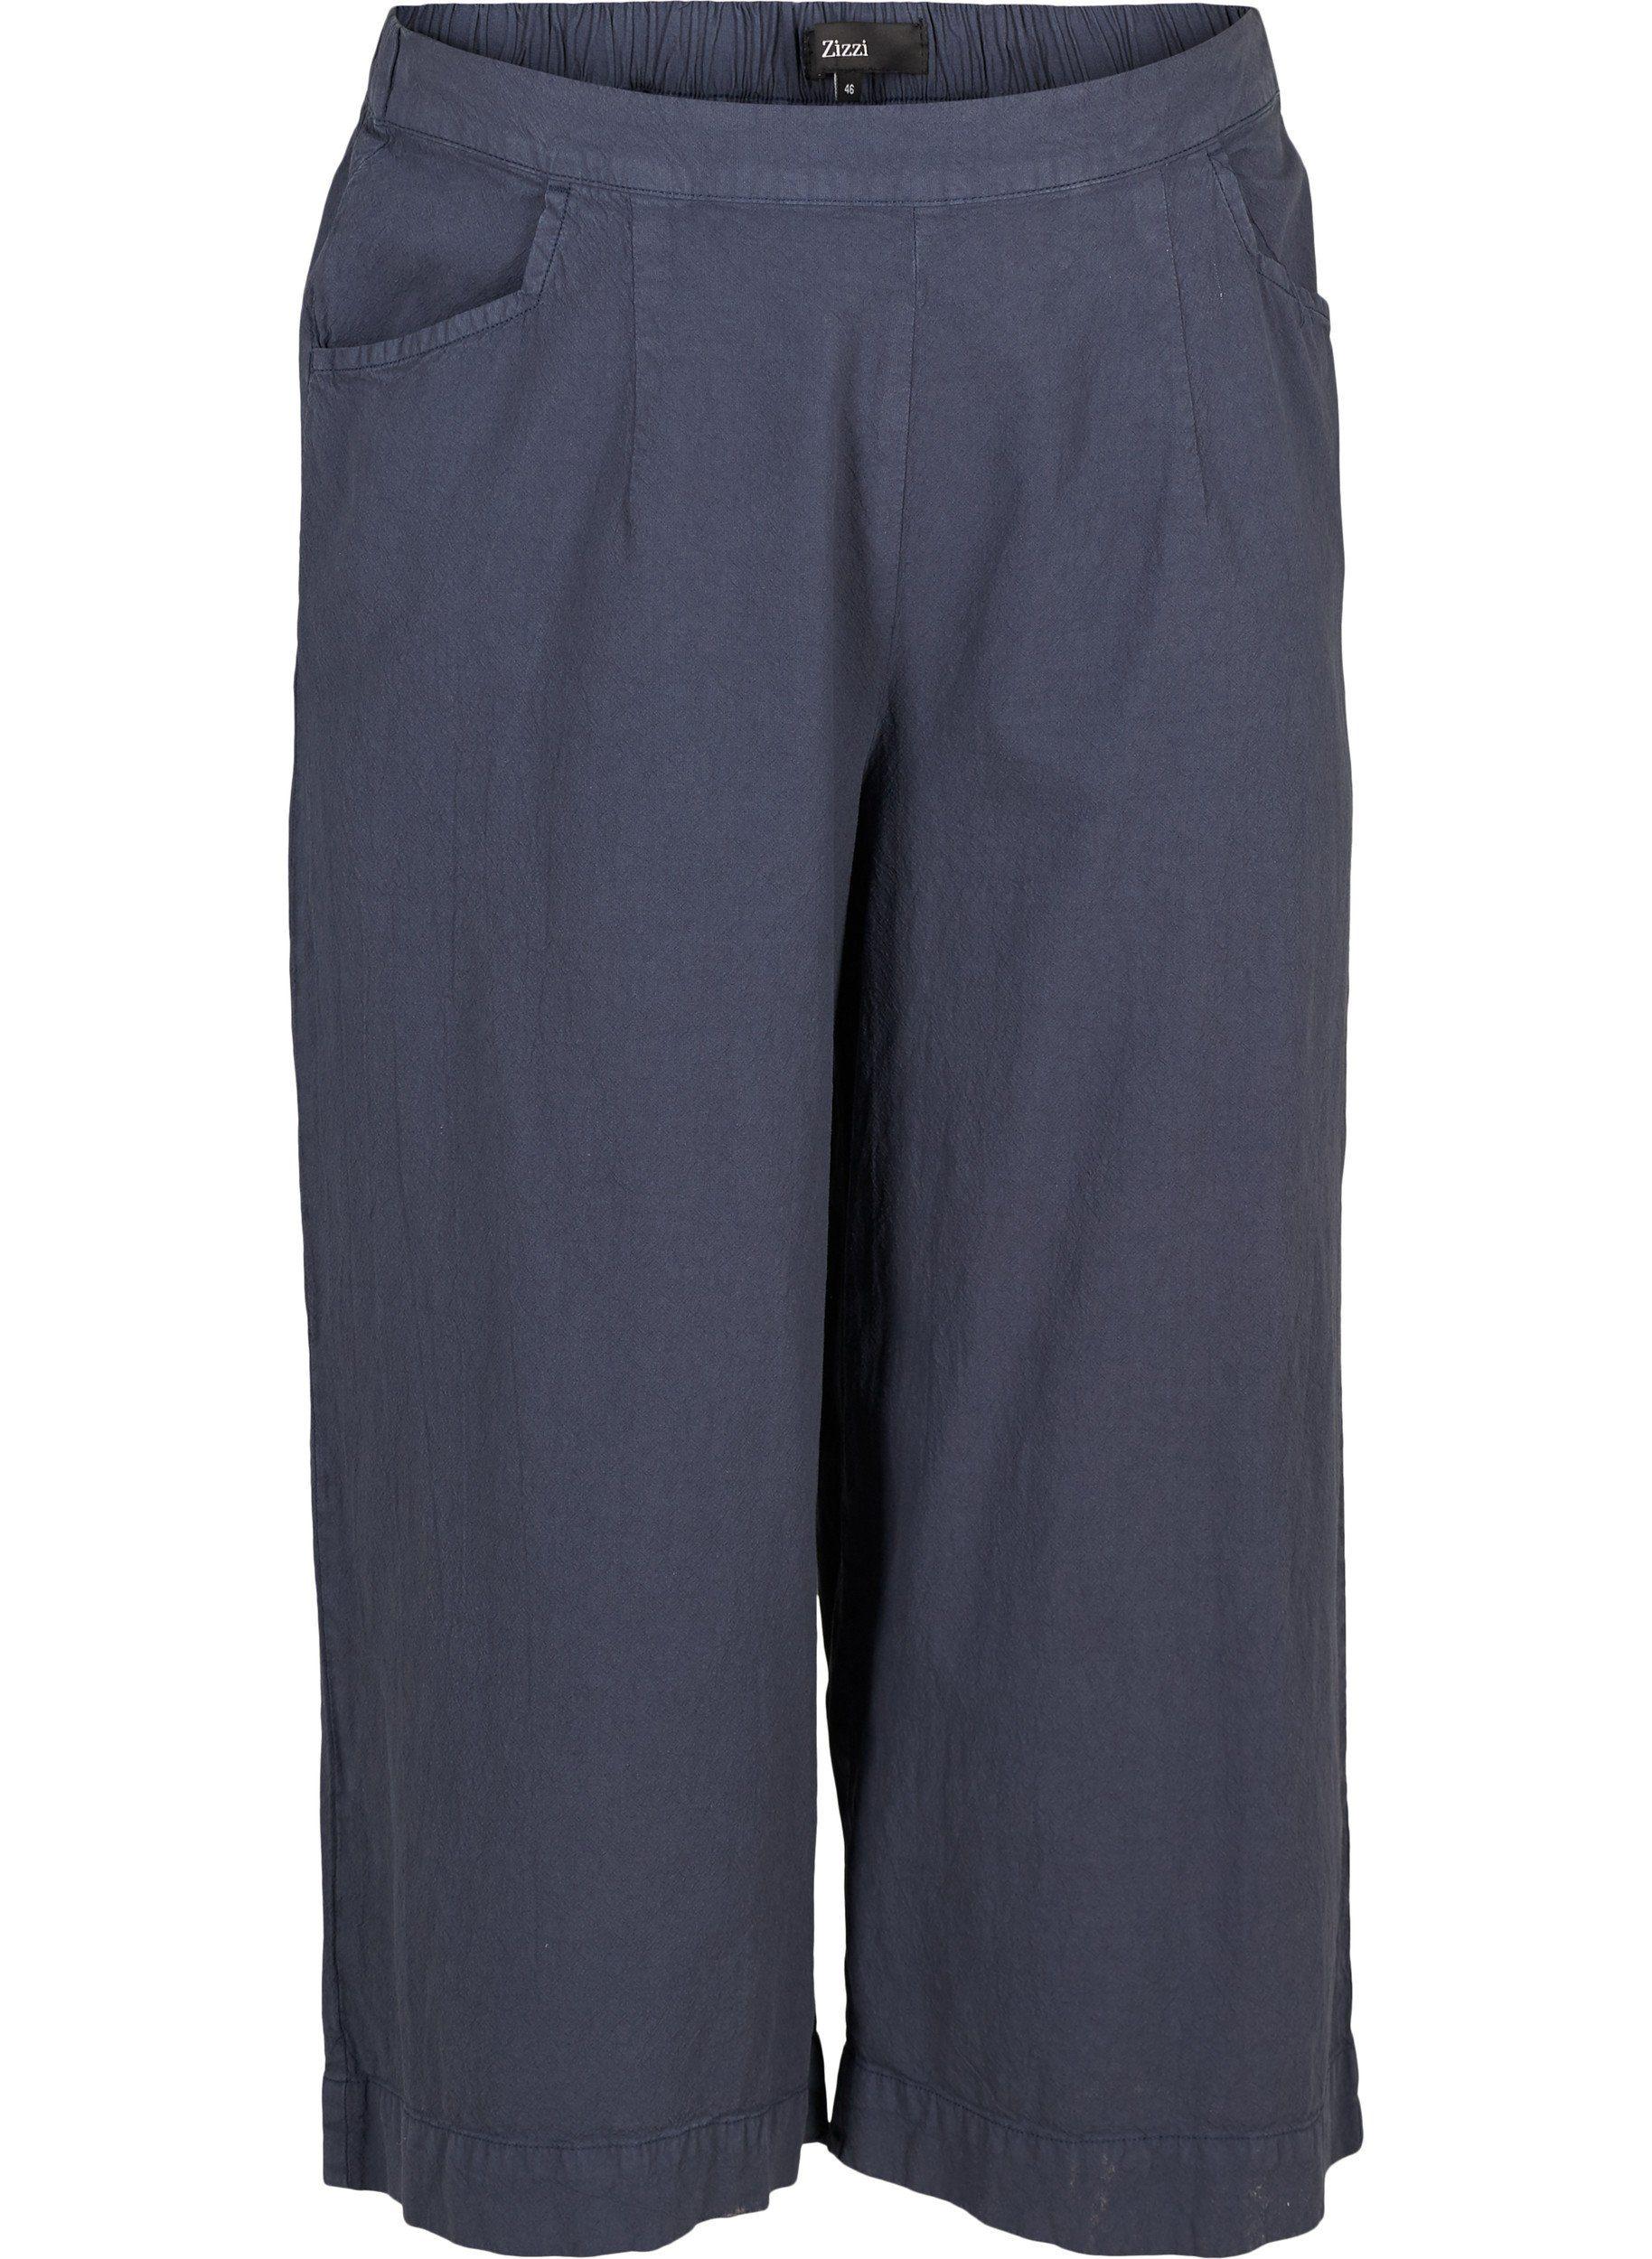 Cat Caterpillar Hommes Boxer Shorts Noir//Bleu Rétro Short unterhos M L XL XXL